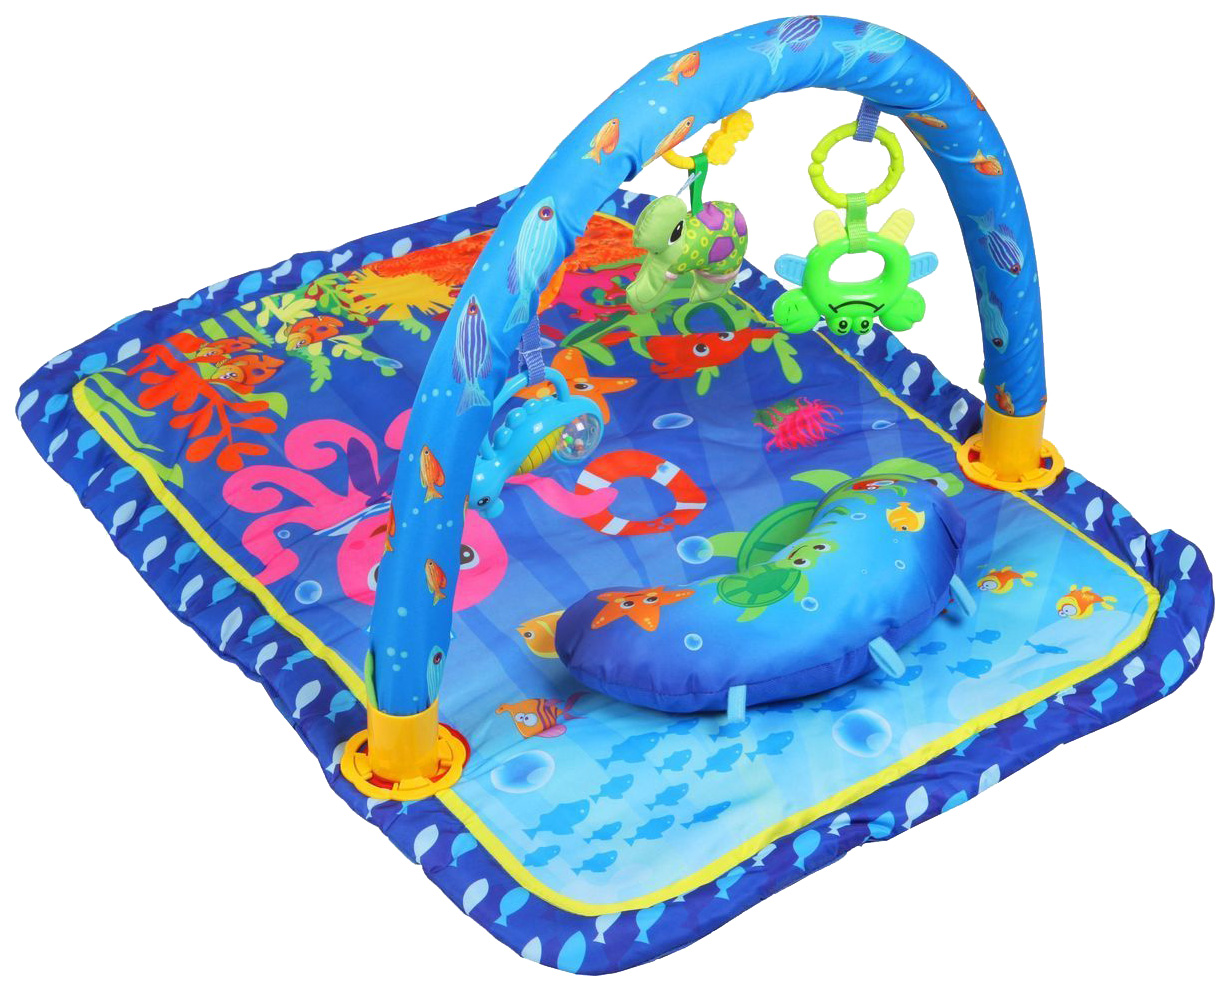 Купить Коврик развивающий Yako Морские обитатели 8300119, Yako Toys, Развивающие коврики и центры